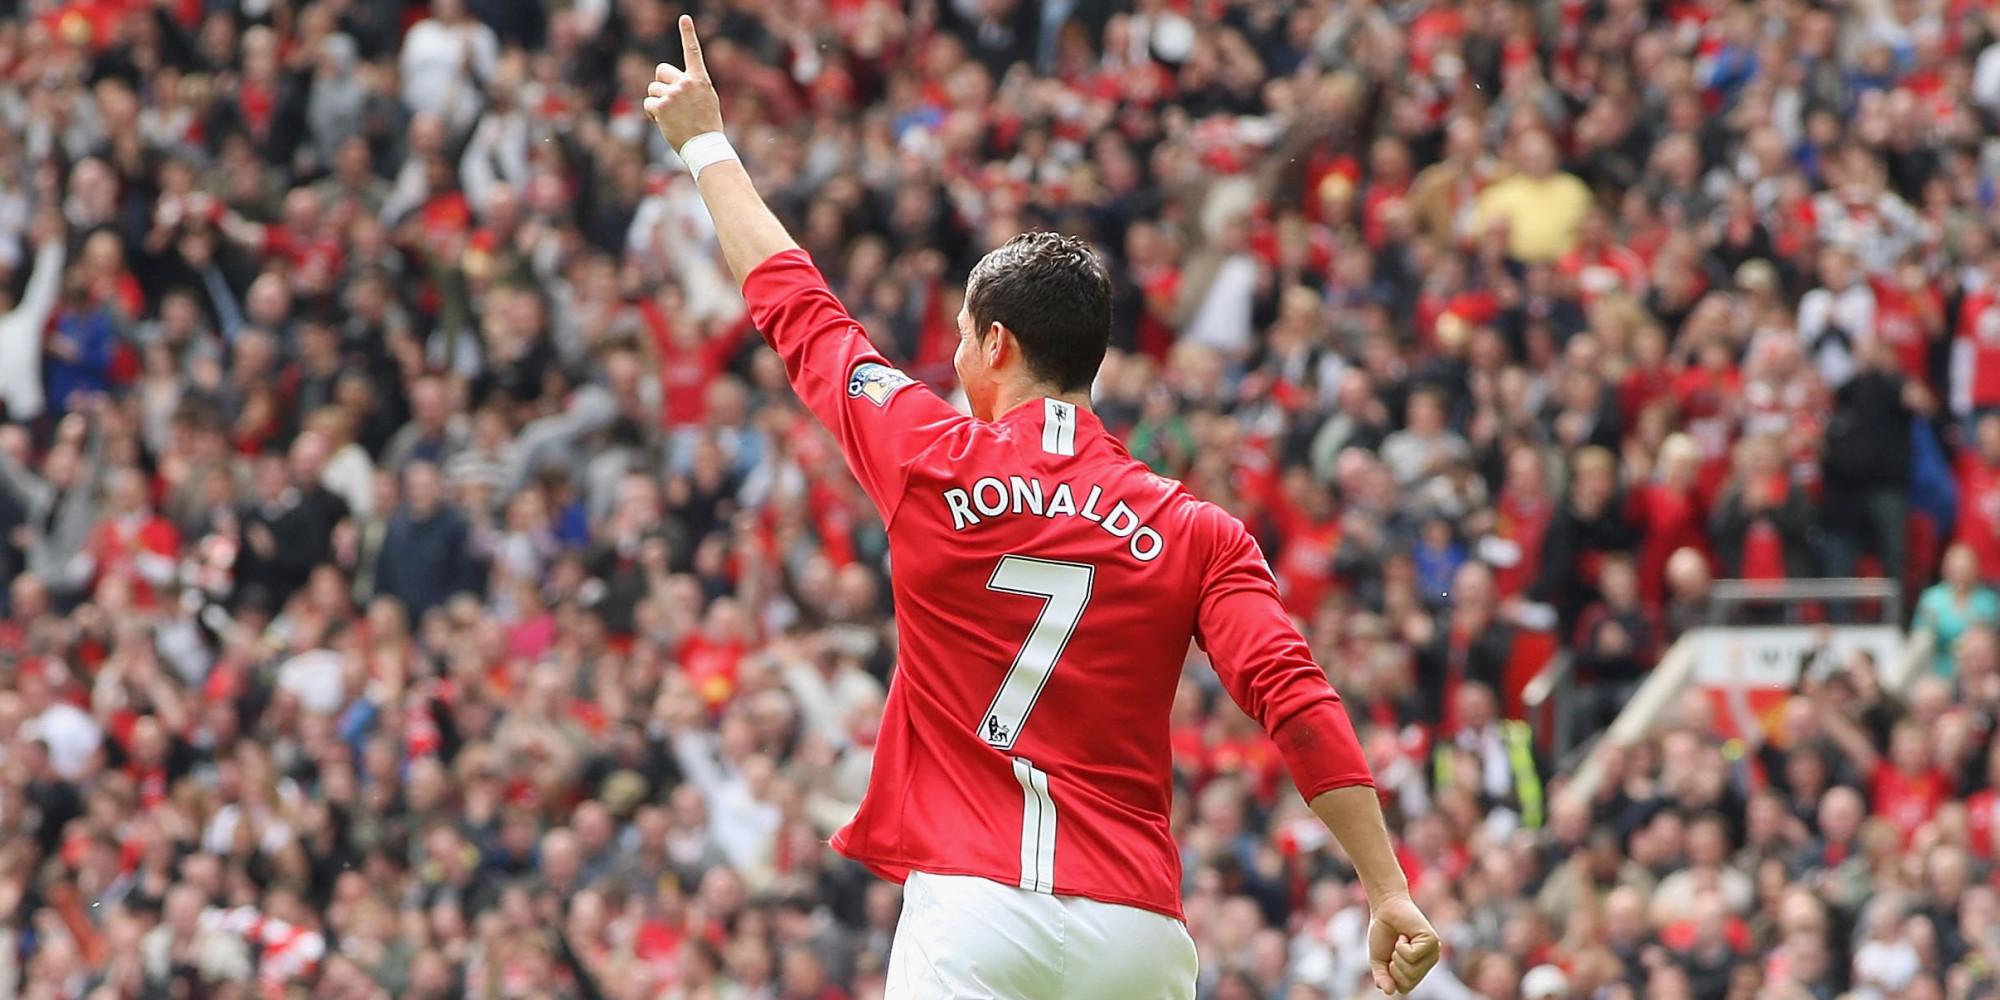 Cristiano Ronaldo Points To The Sky. [2000x1000] [Desktop